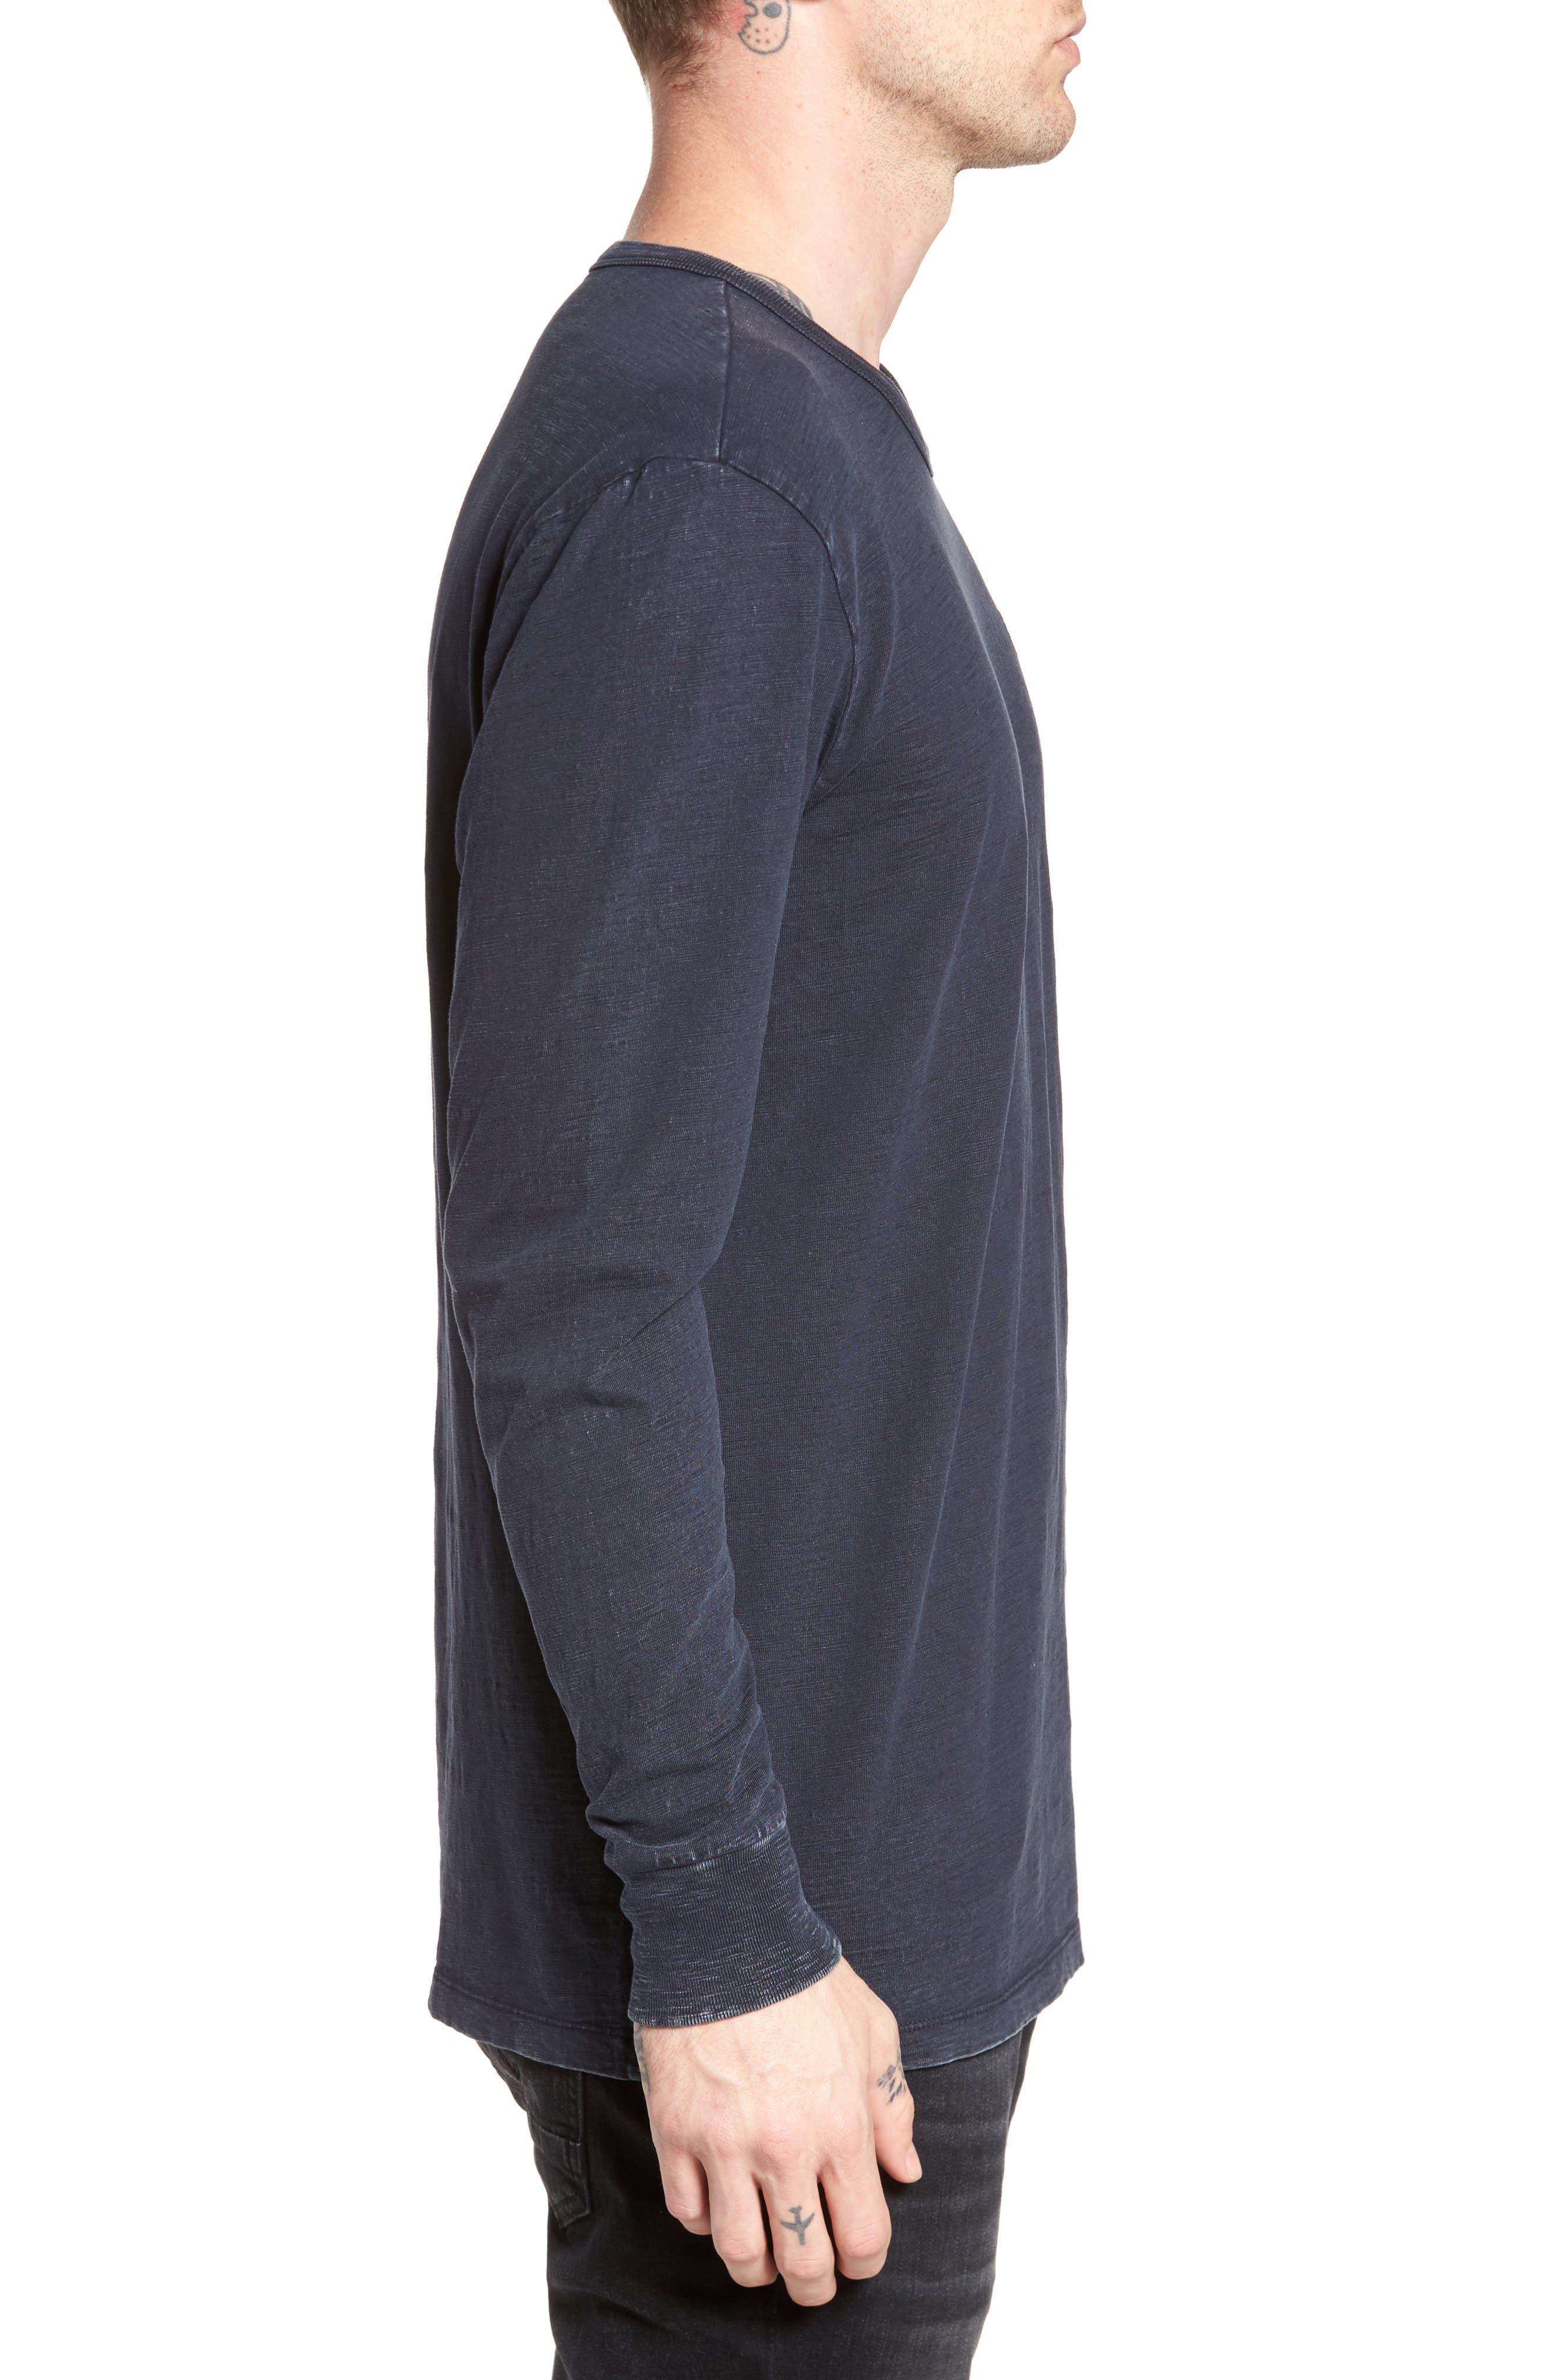 Kantano T-Shirt,                             Alternate thumbnail 3, color,                             400